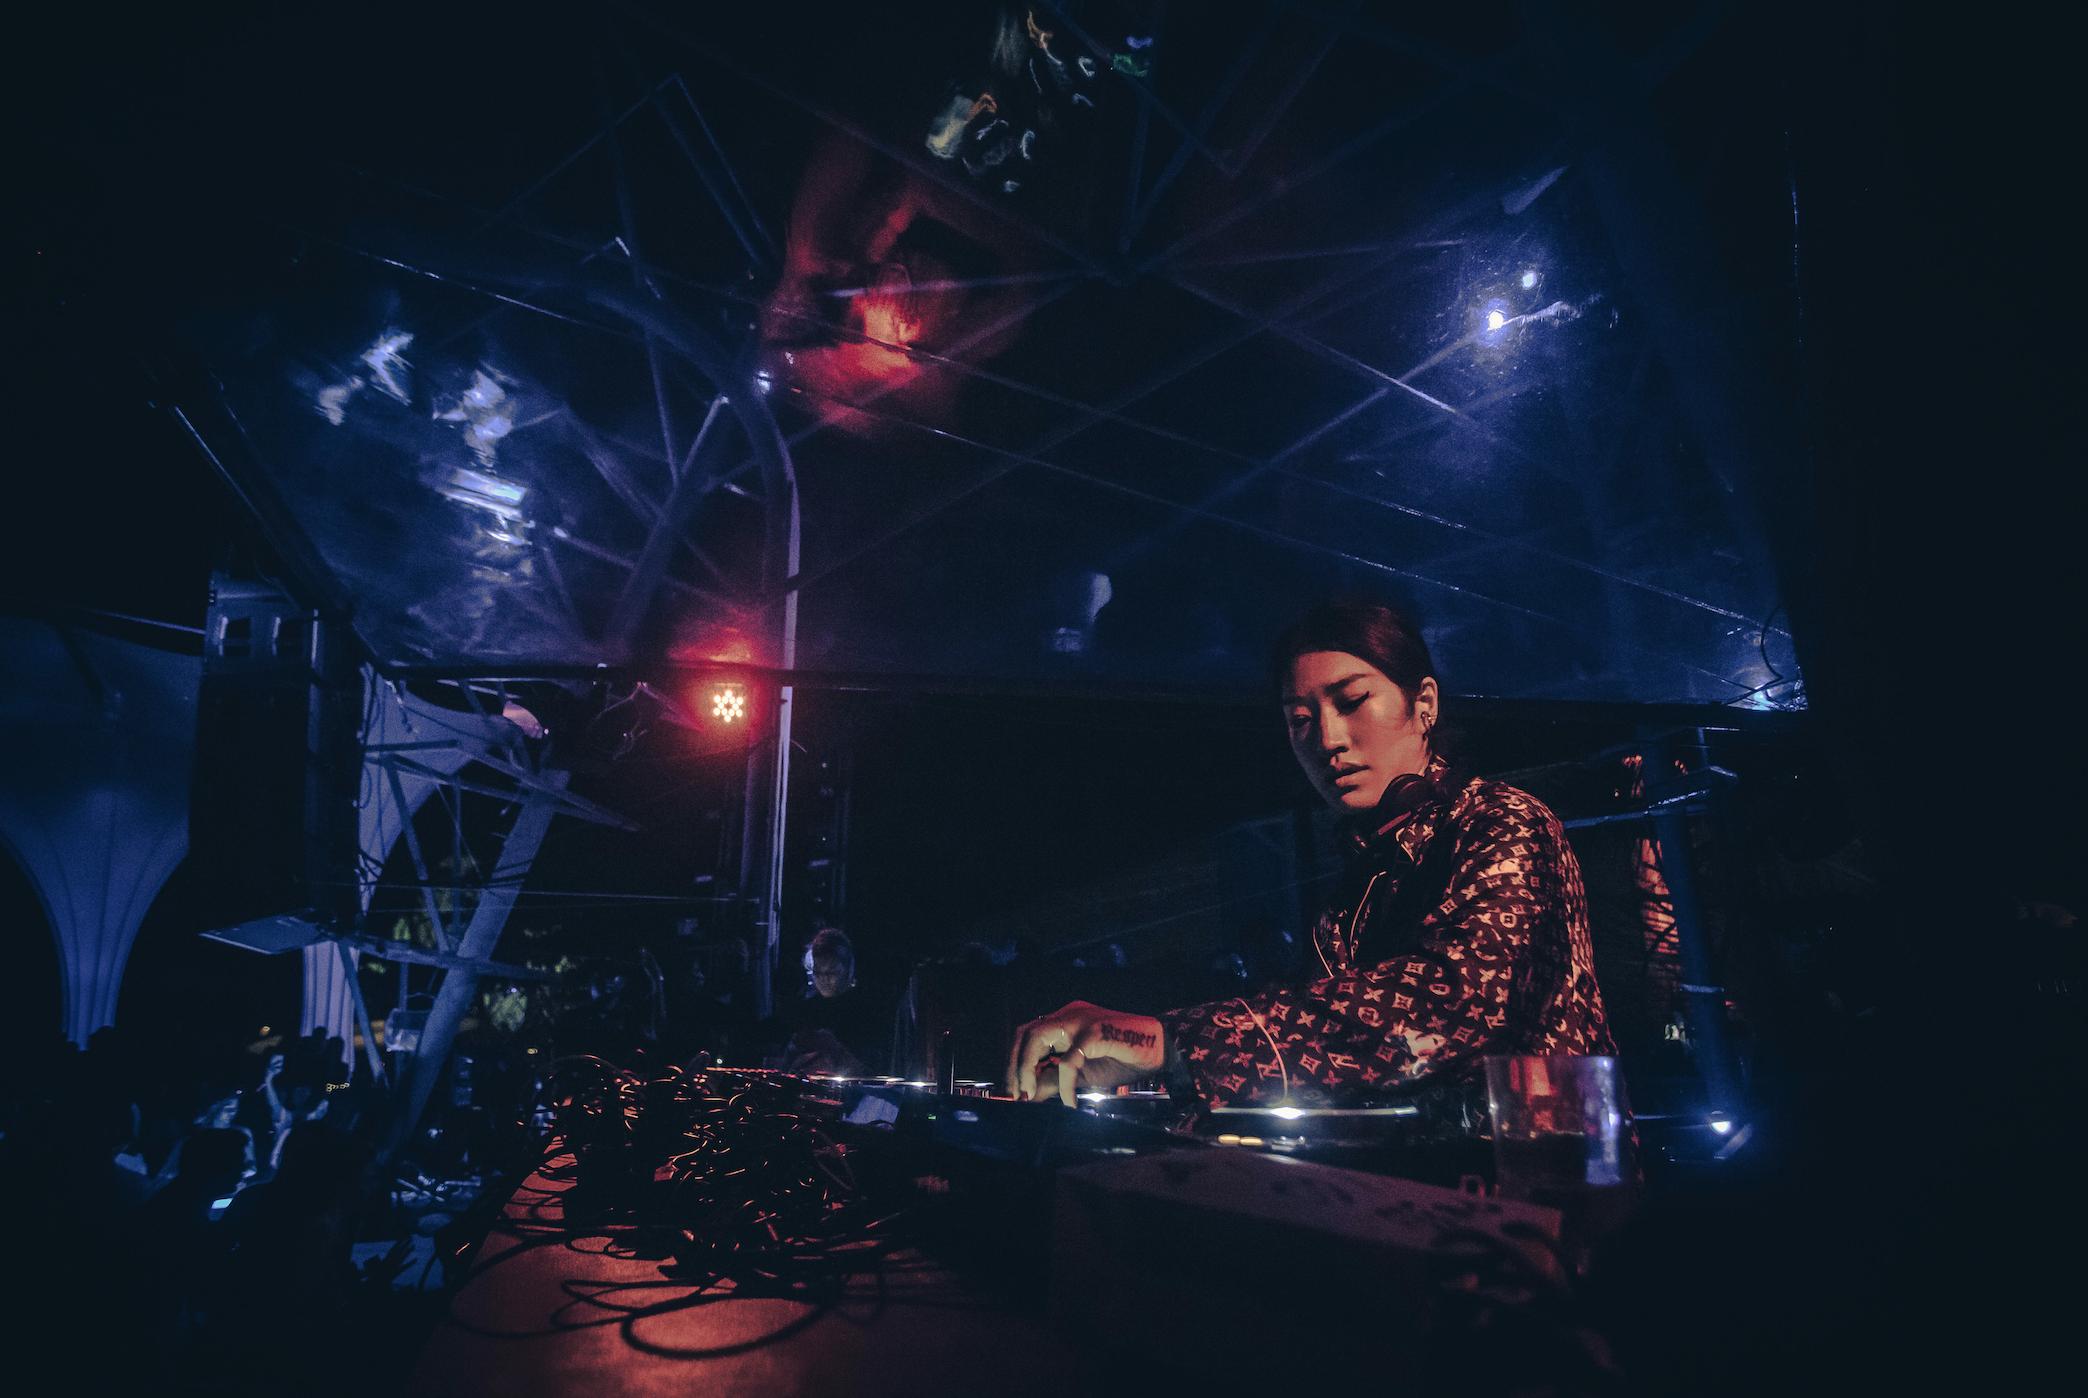 Epizode is Vietnam's 24-hour festival for house and techno fanatics